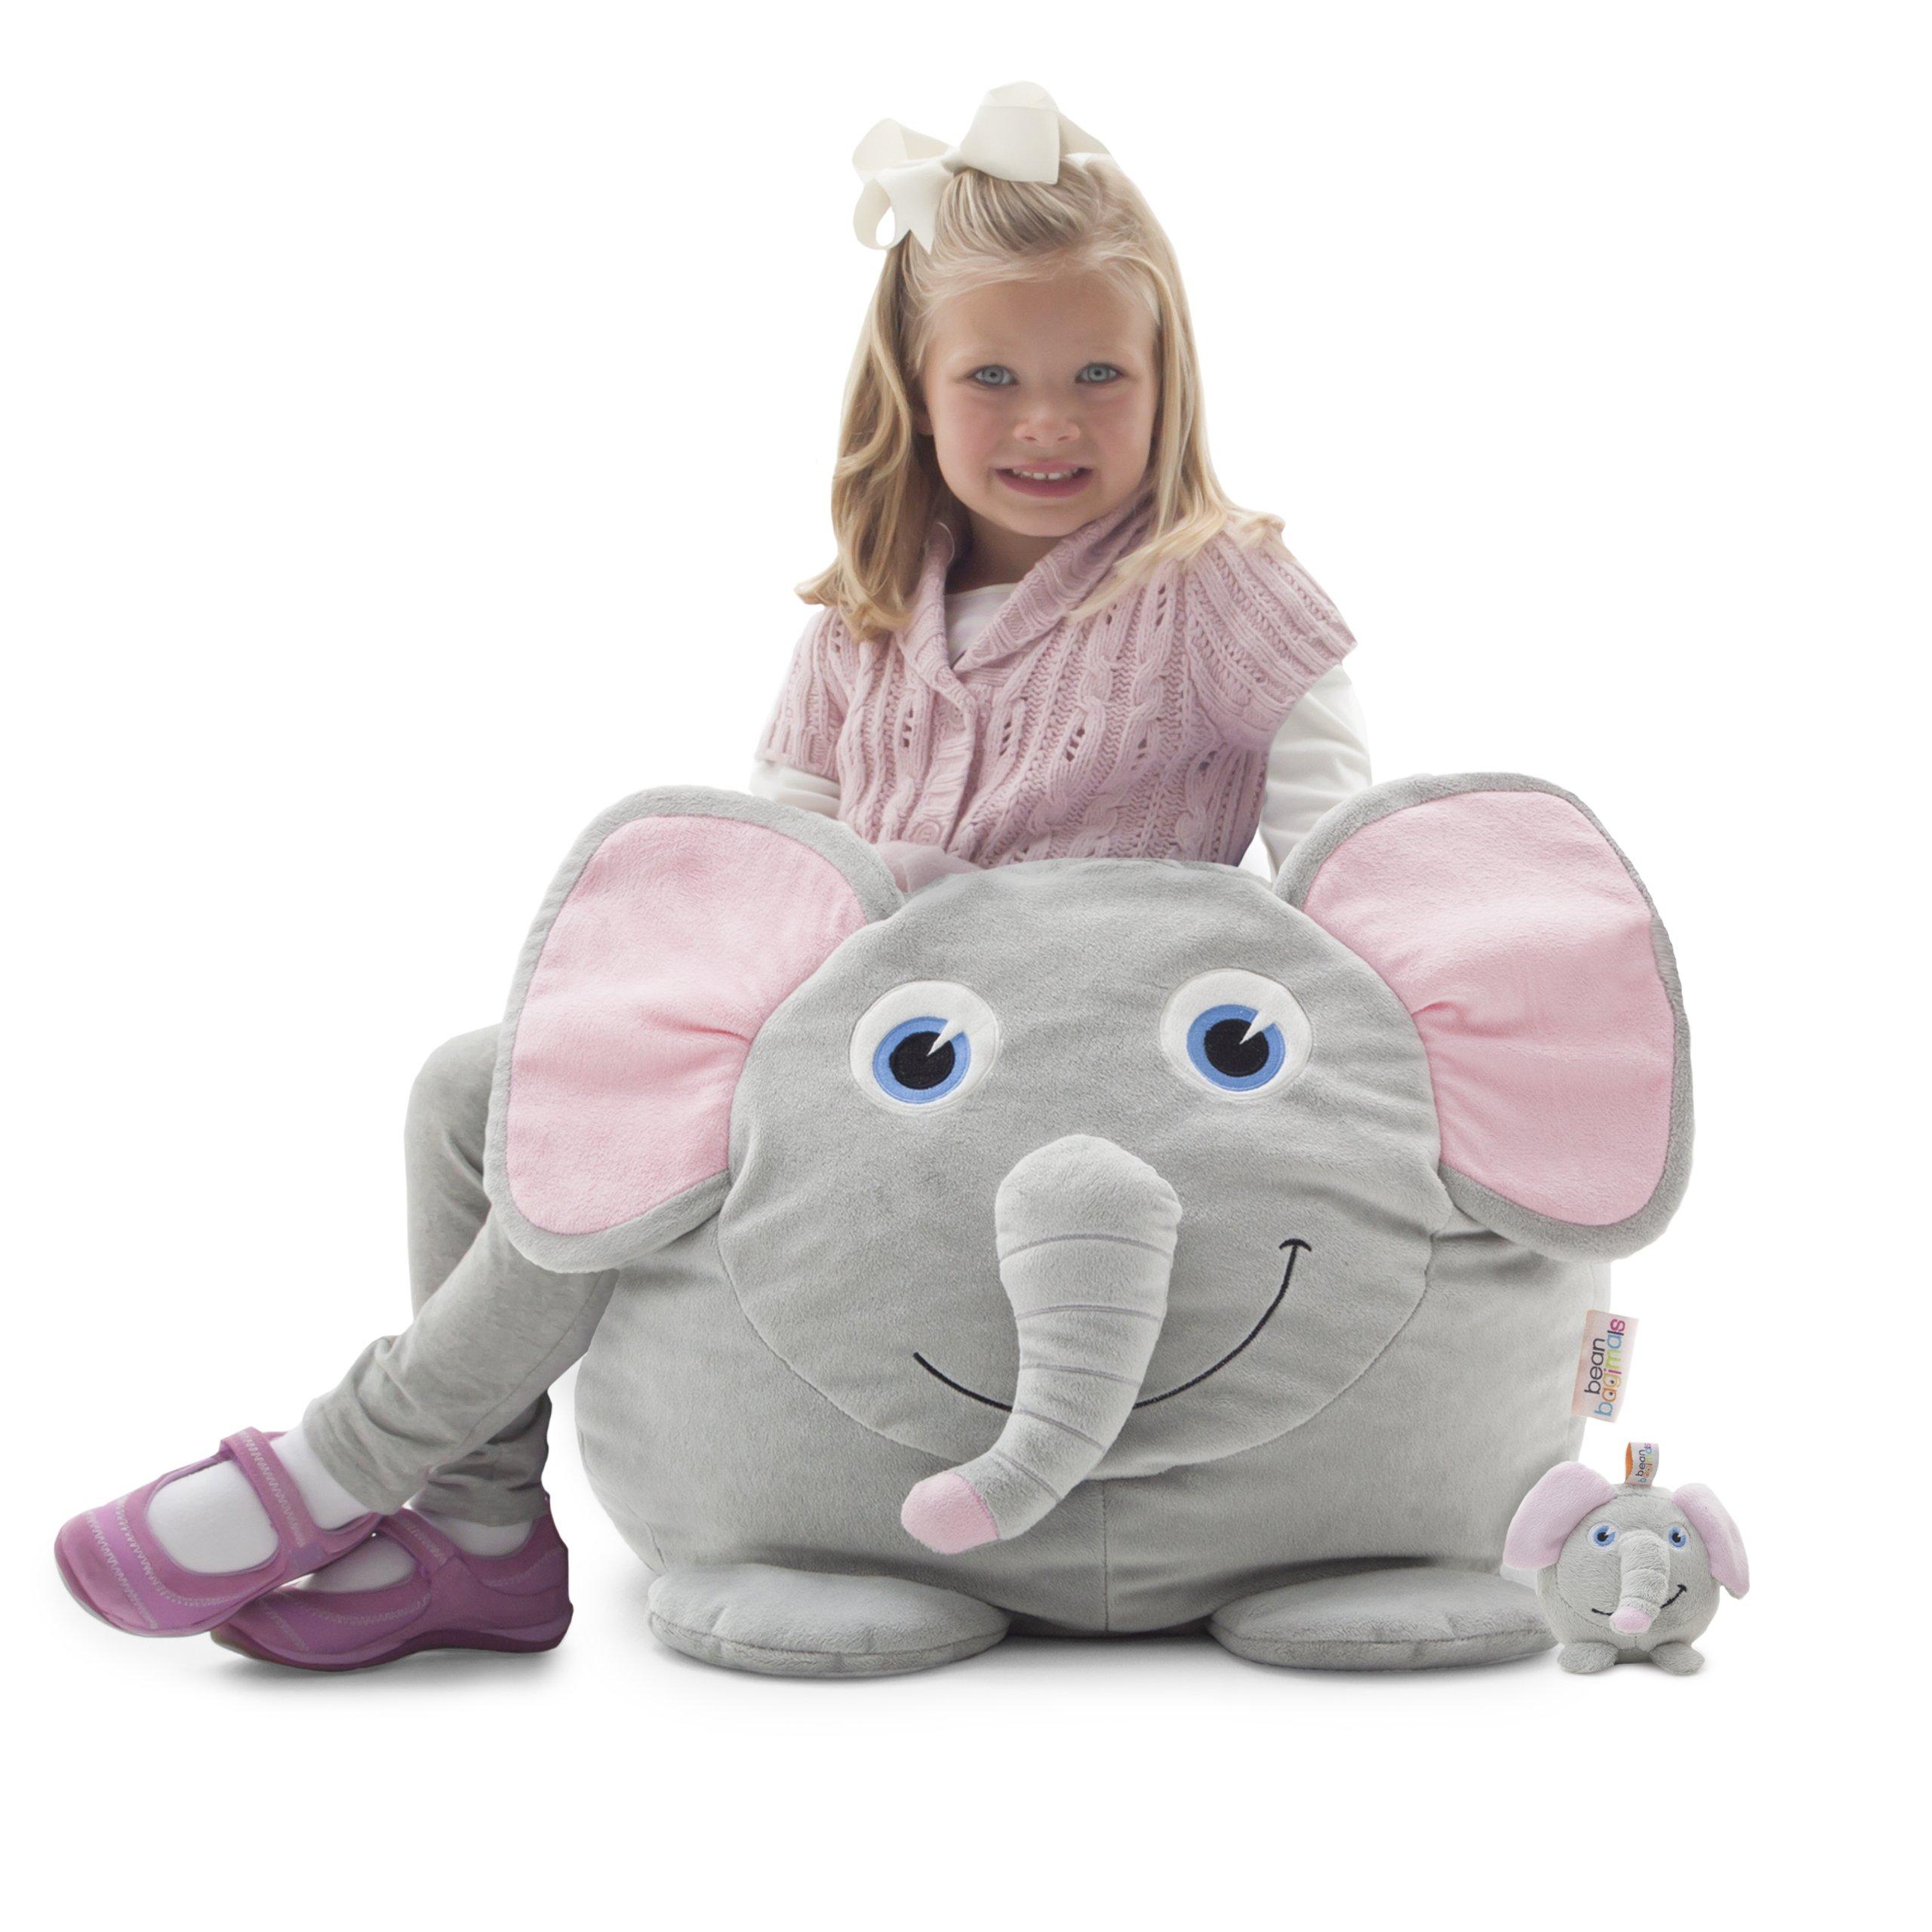 Big Joe Bean Bagimal, Emerson the Elephant